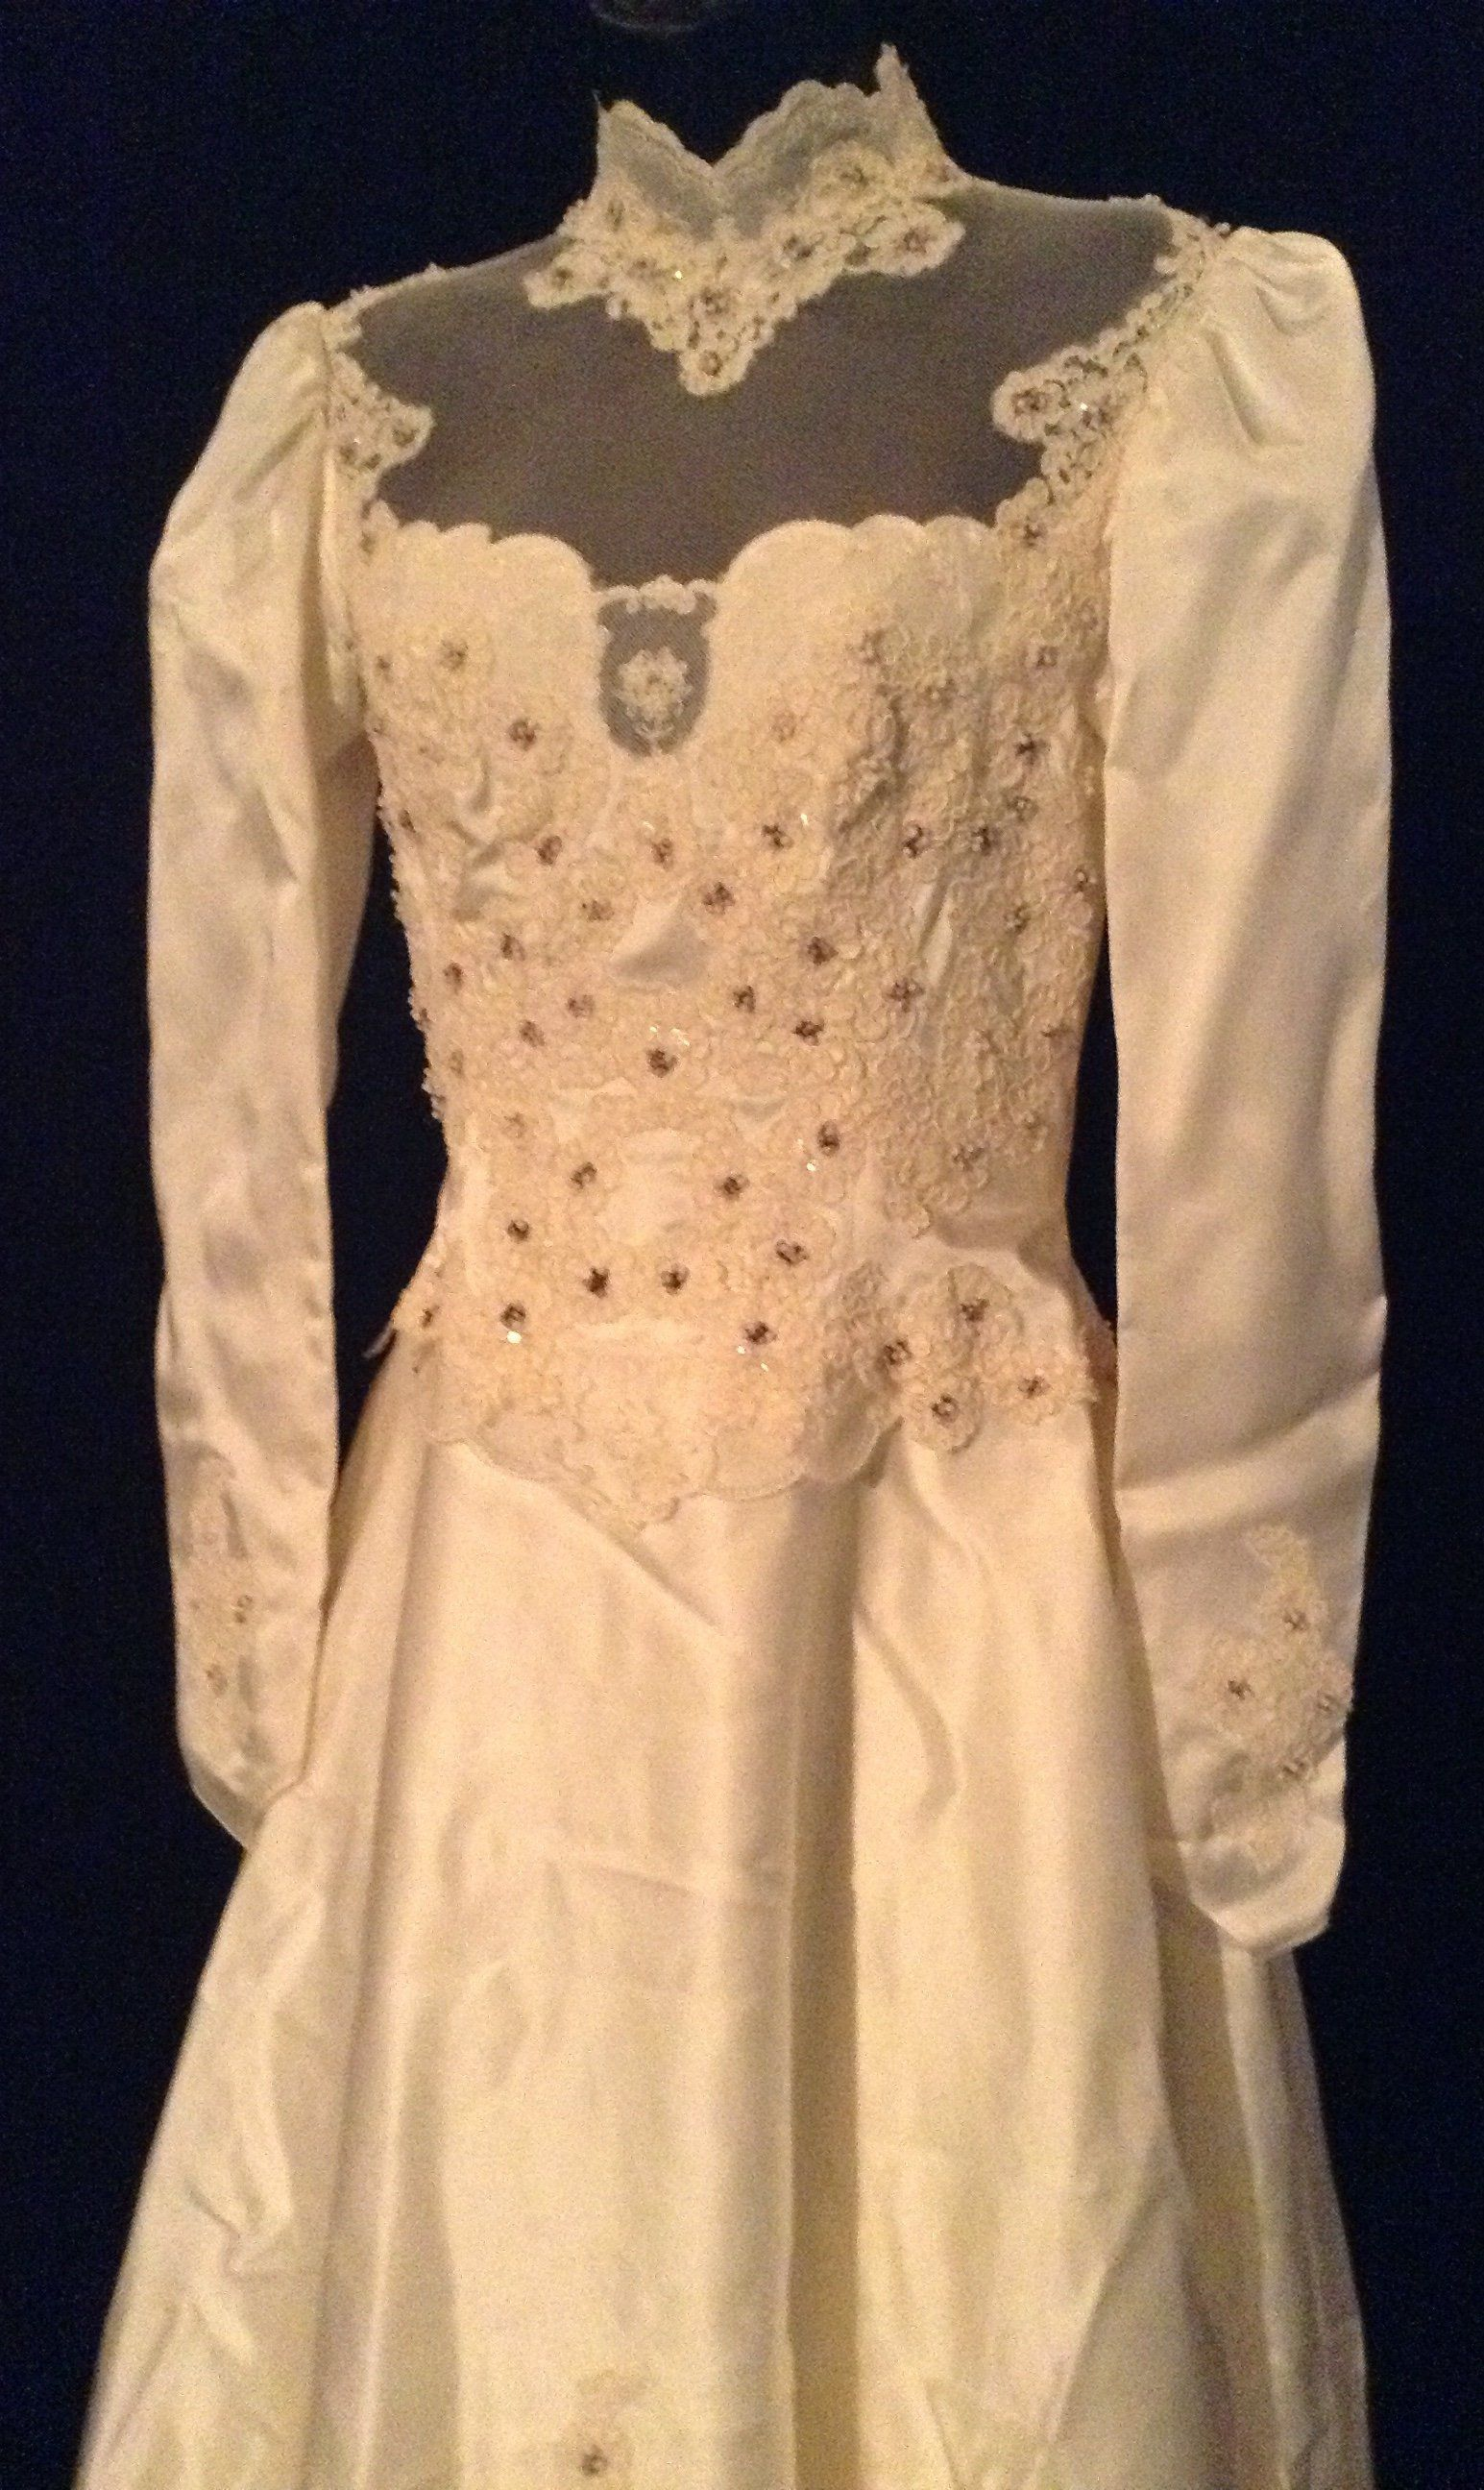 Alfred angelo dream maker wedding dress  Vintage us Wedding Dress Victorian Style ALine Ivory Satin Long